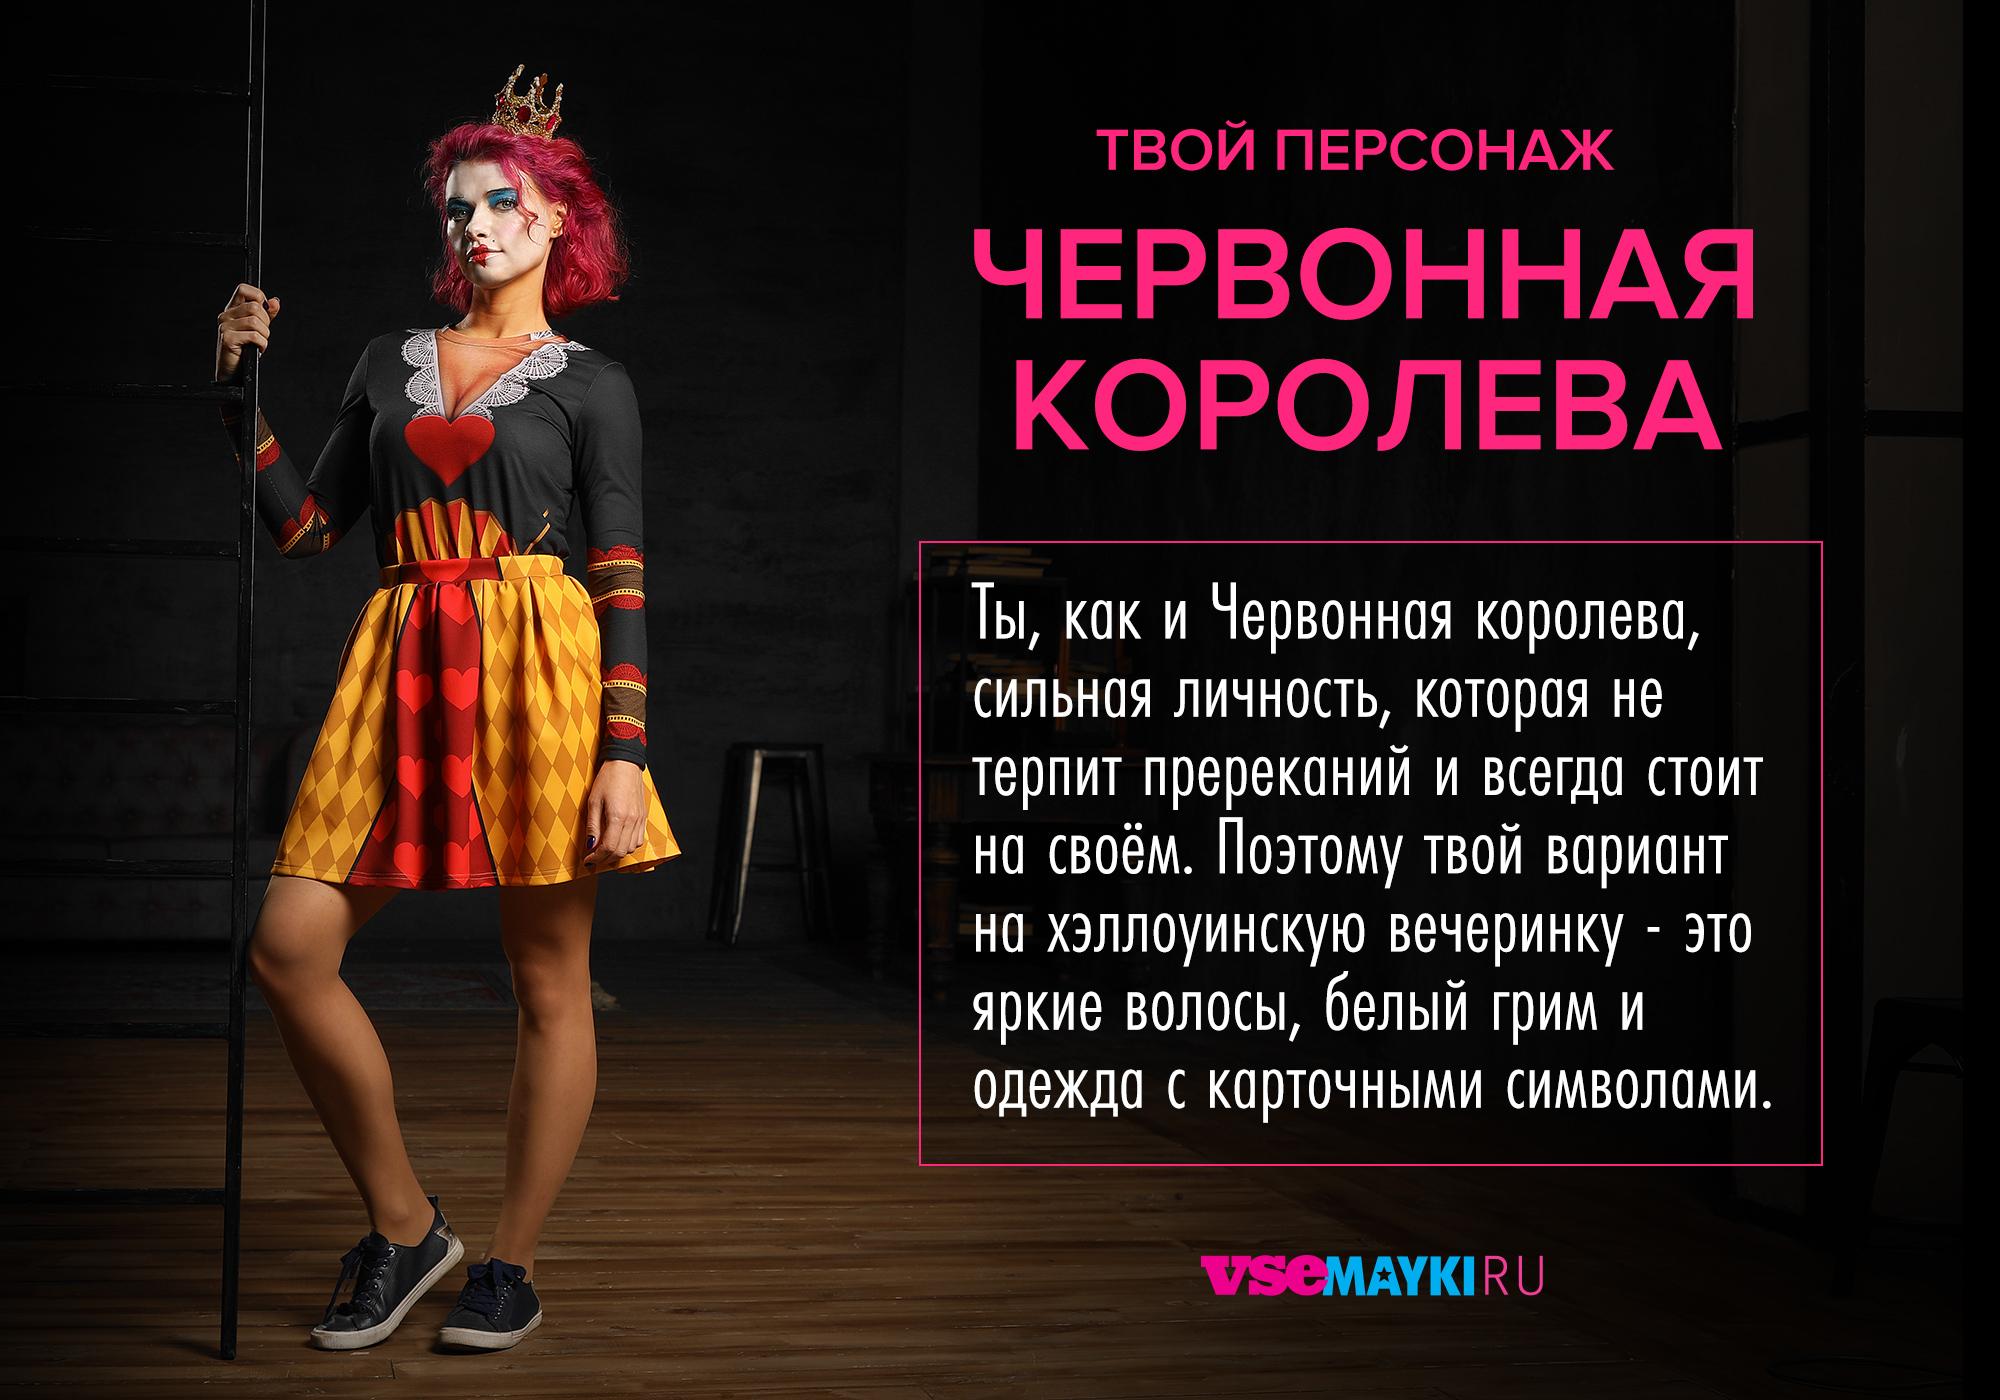 Koroleva